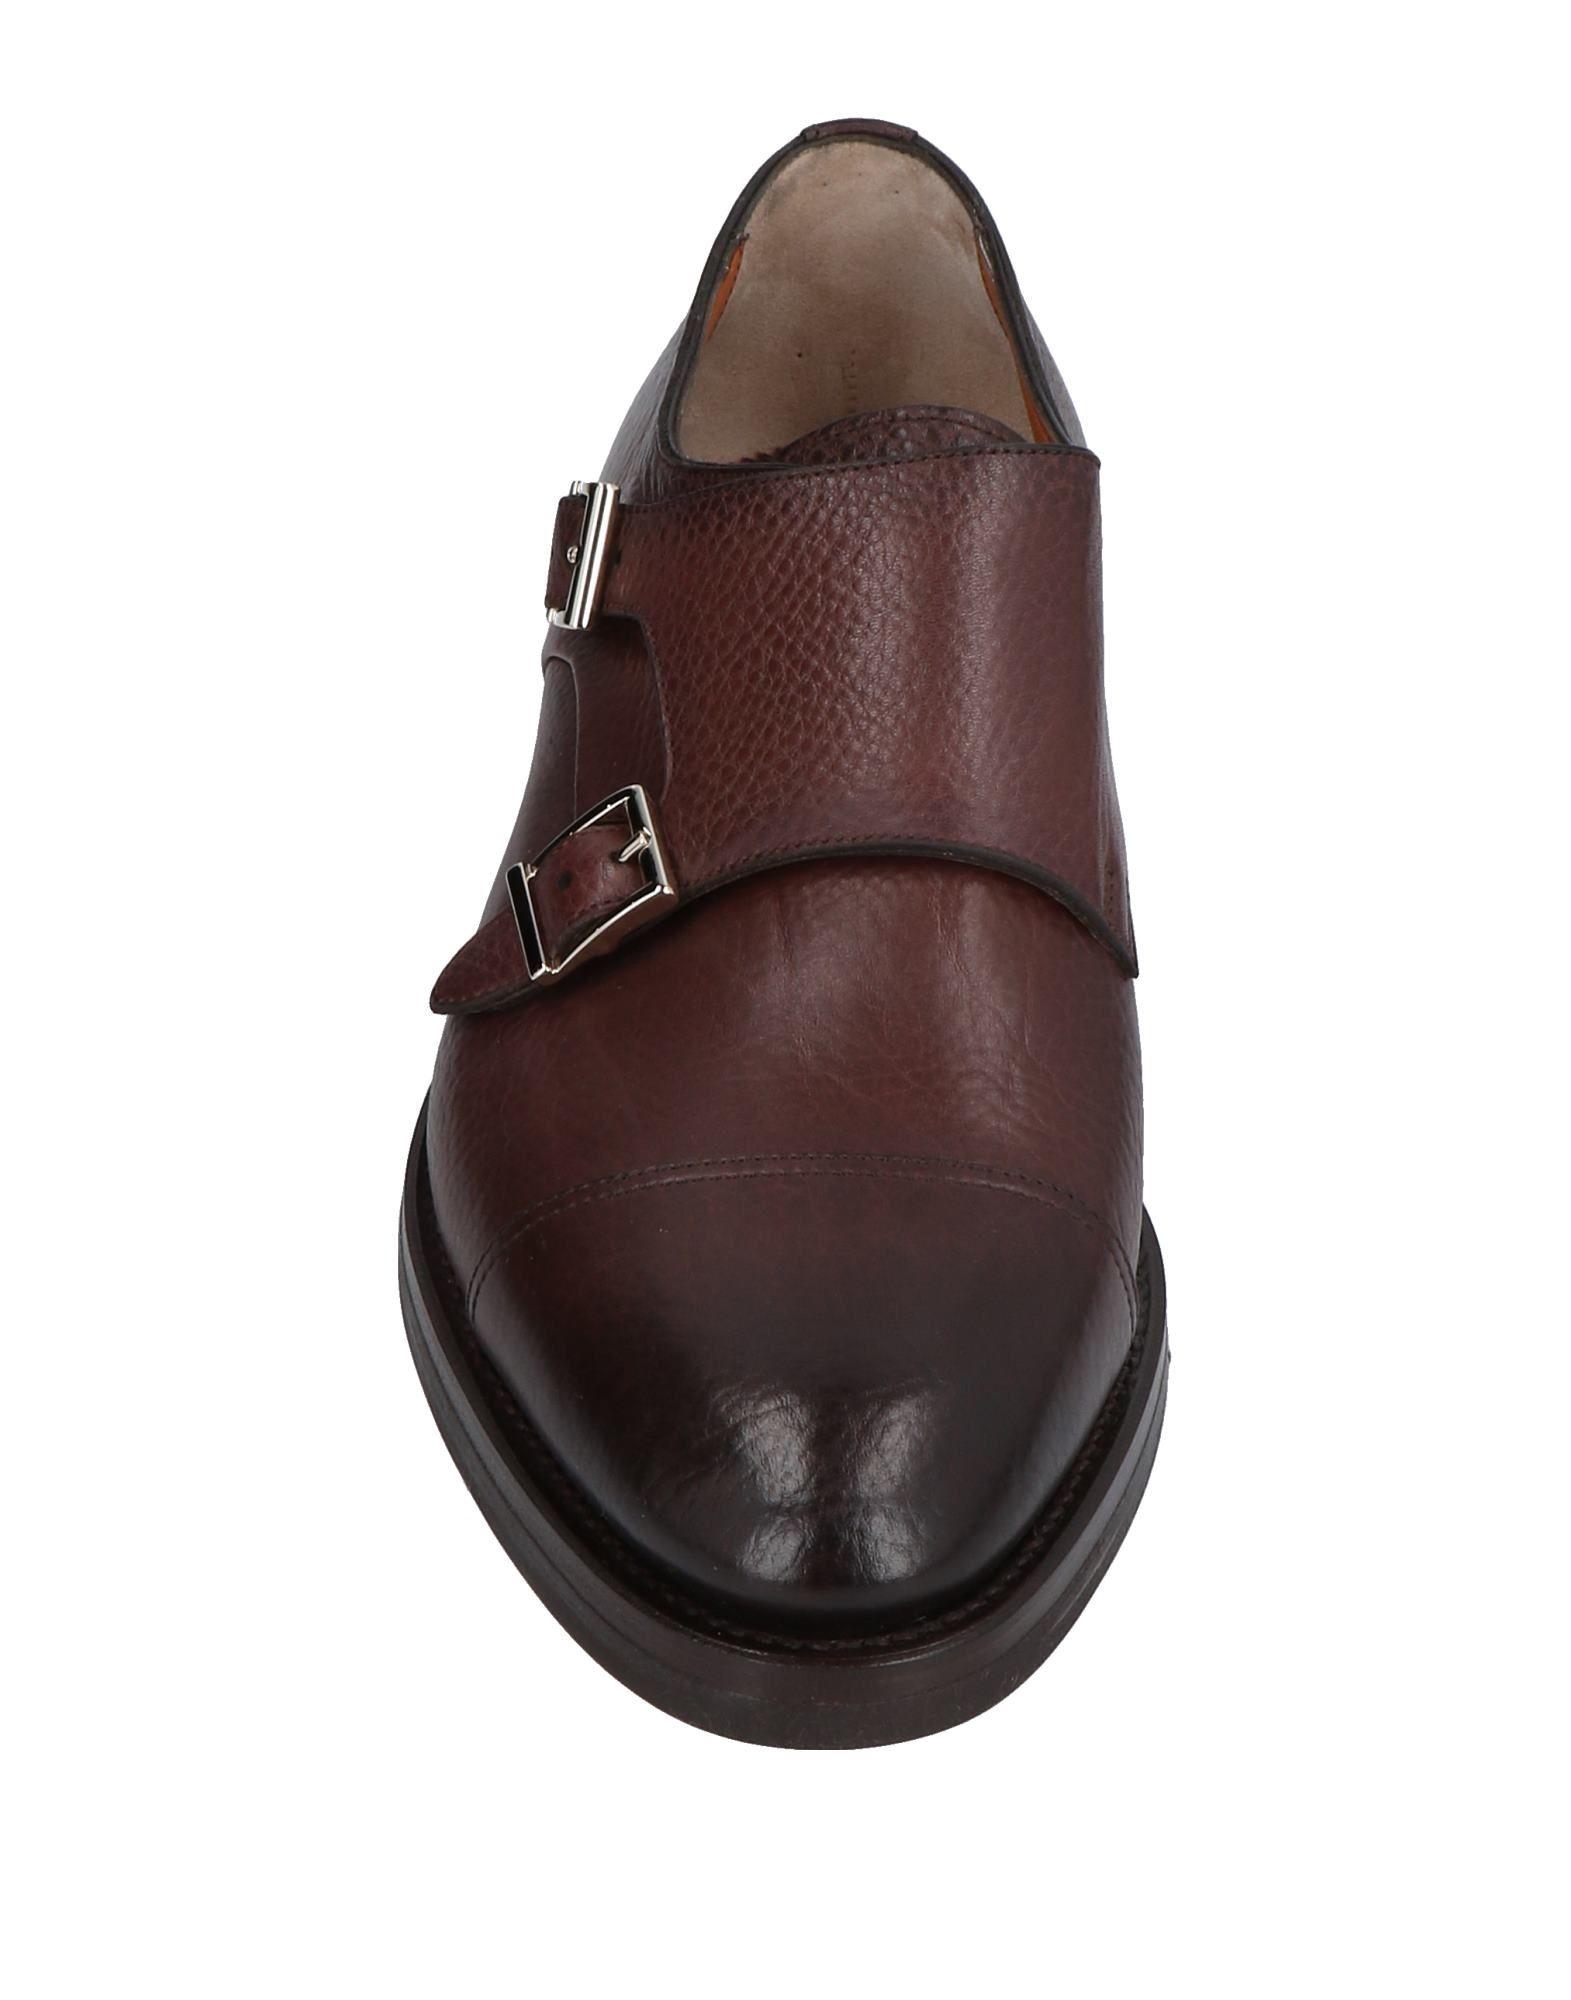 Santoni 11478559HG Mokassins Herren  11478559HG Santoni Gute Qualität beliebte Schuhe 2042c5